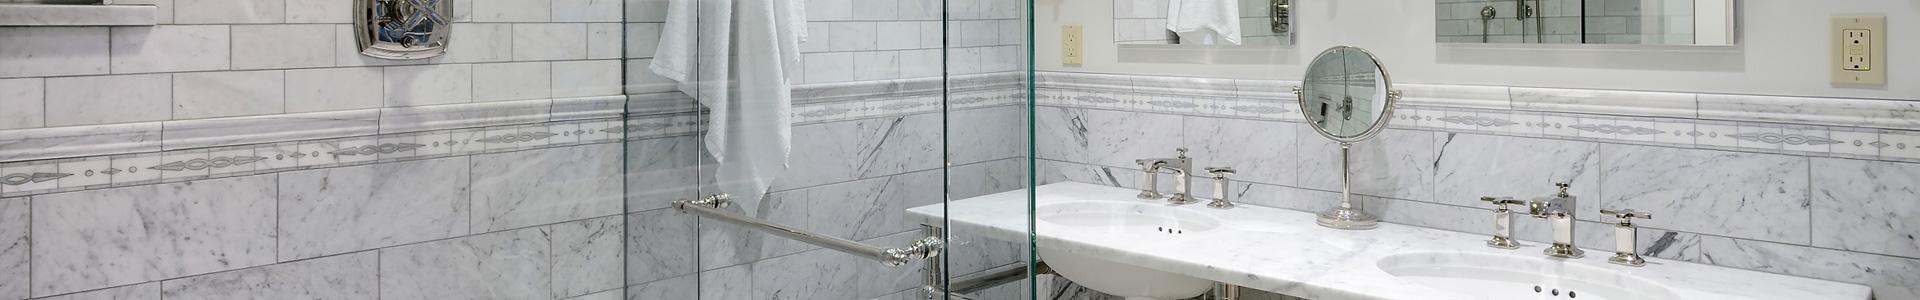 Dunwoody Bathroom Remodeling Contractors | Bathroom Renovation Dunwoody GA